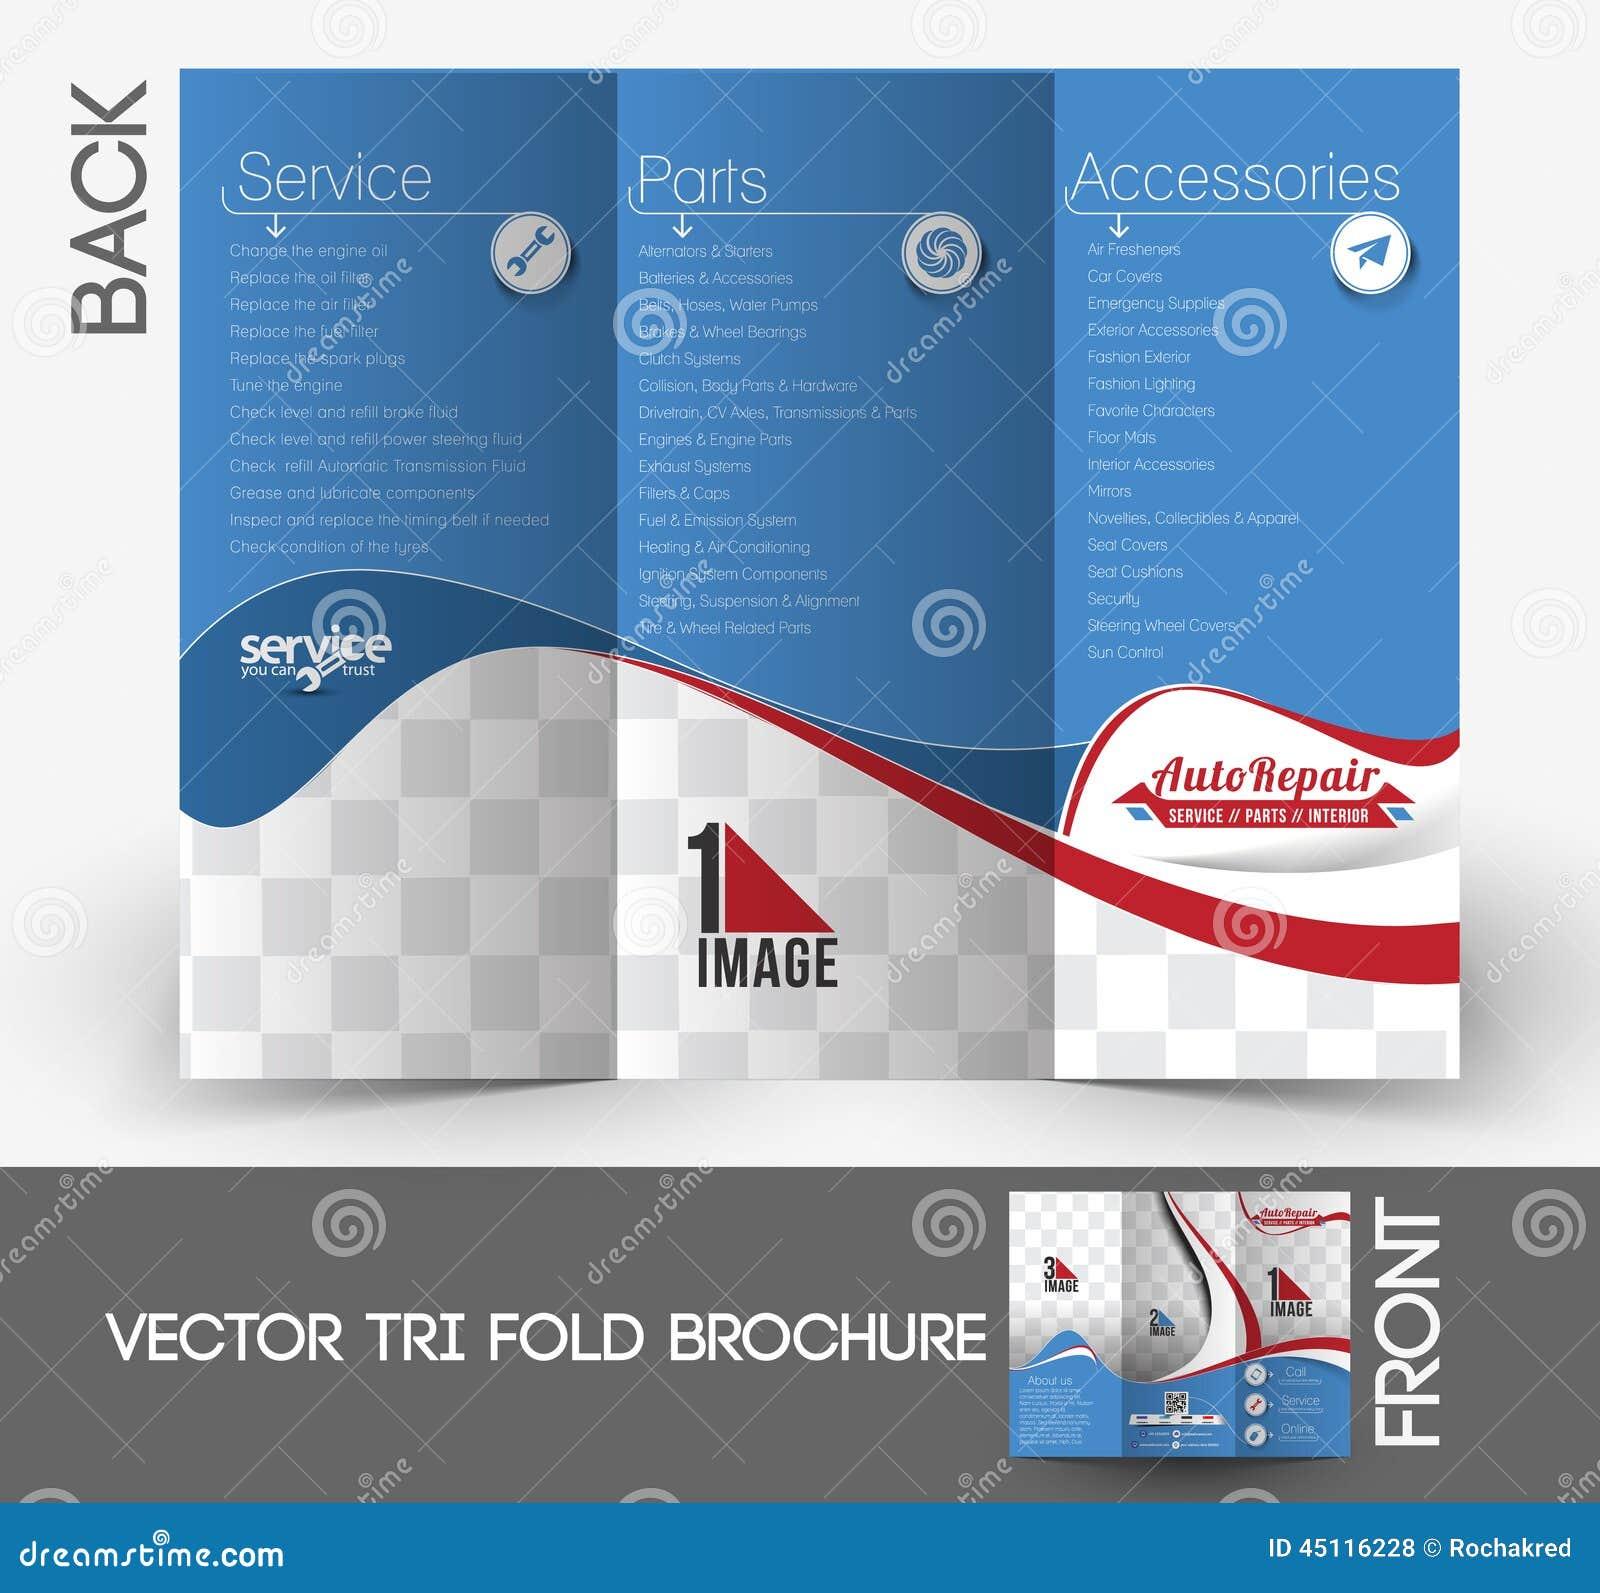 Automobile center tri fold brochure stock vector image for Automobile brochure design